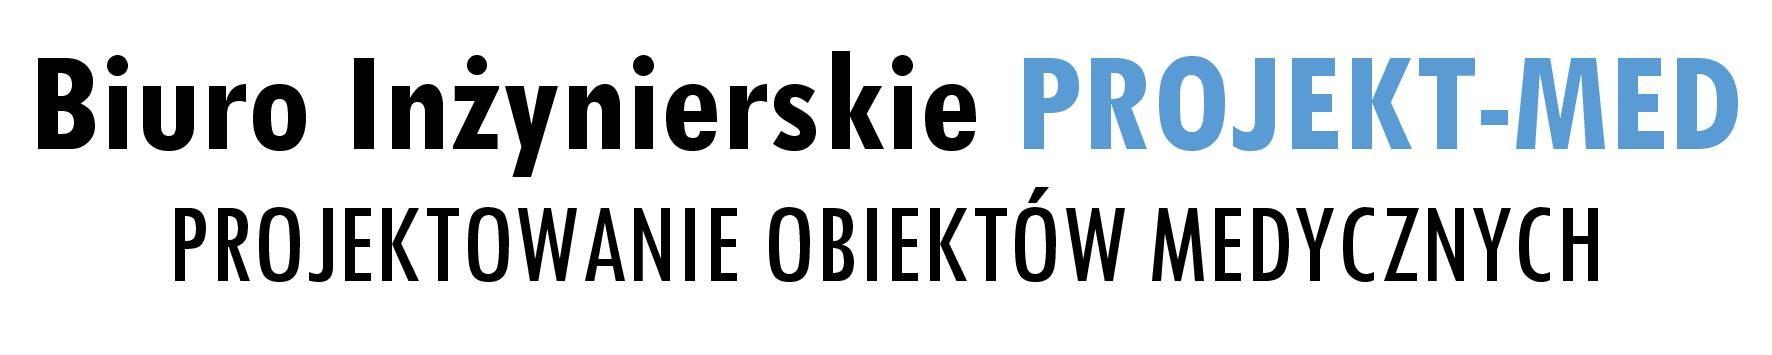 Biuro Inżynierskie PROJEKT-MED